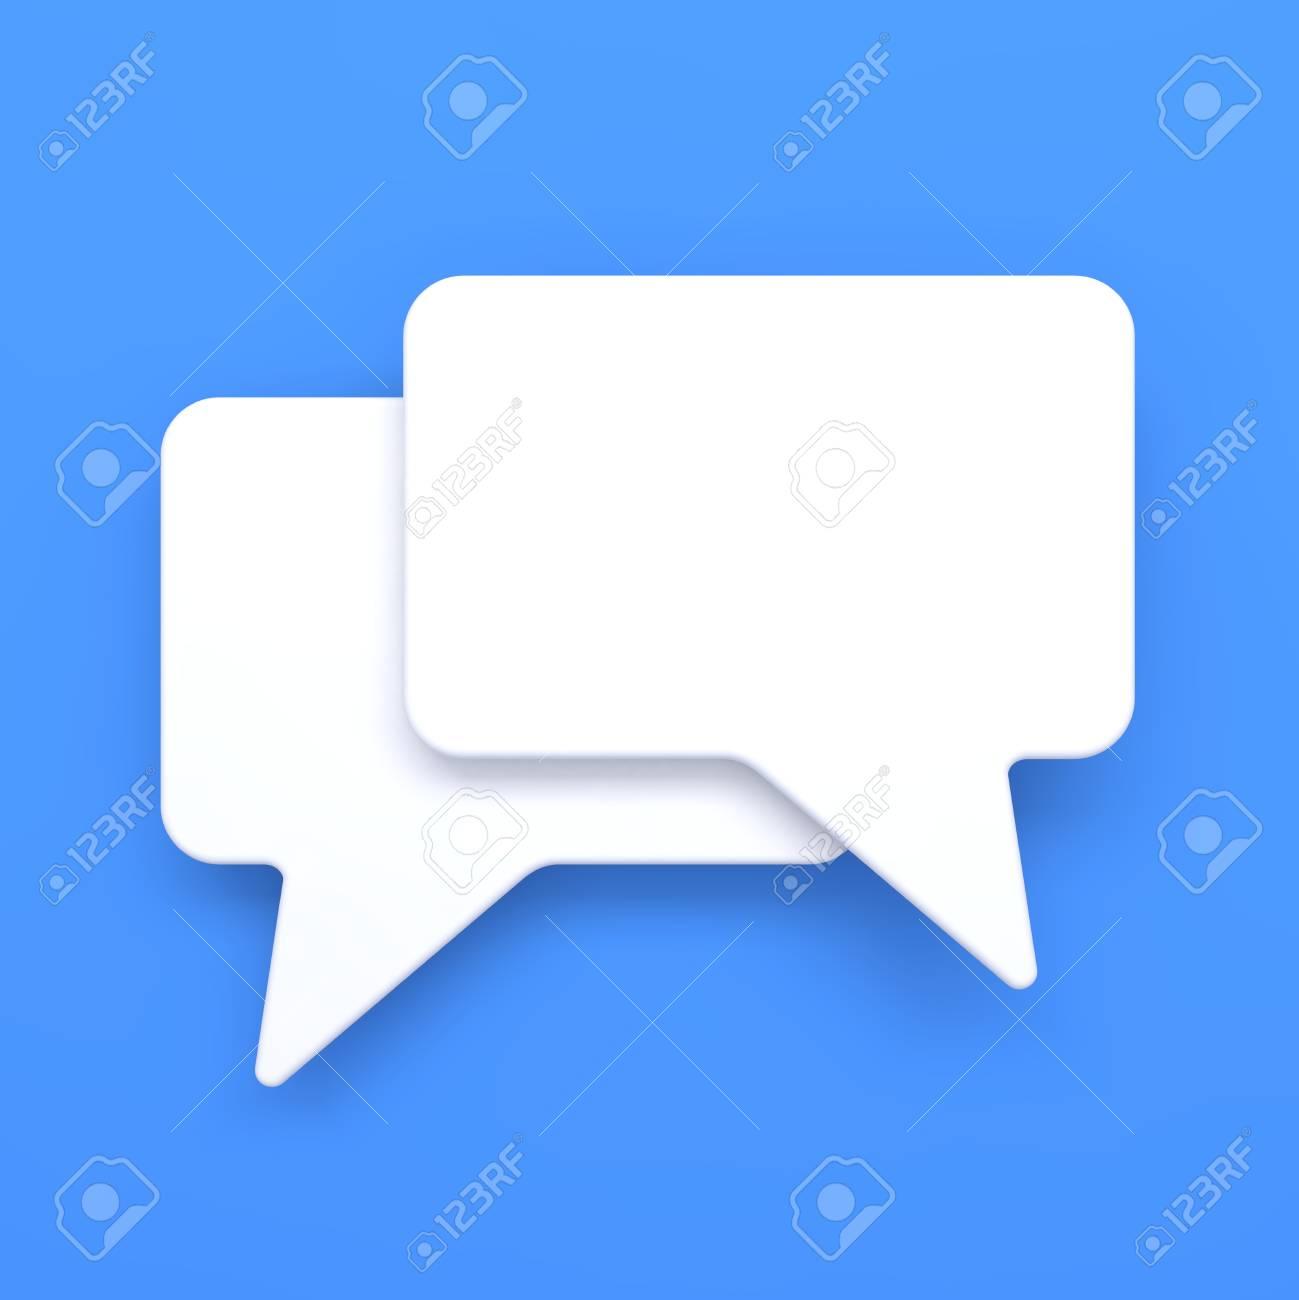 Blank Speech Bubble on Blue Background Stock Photo - 15328523